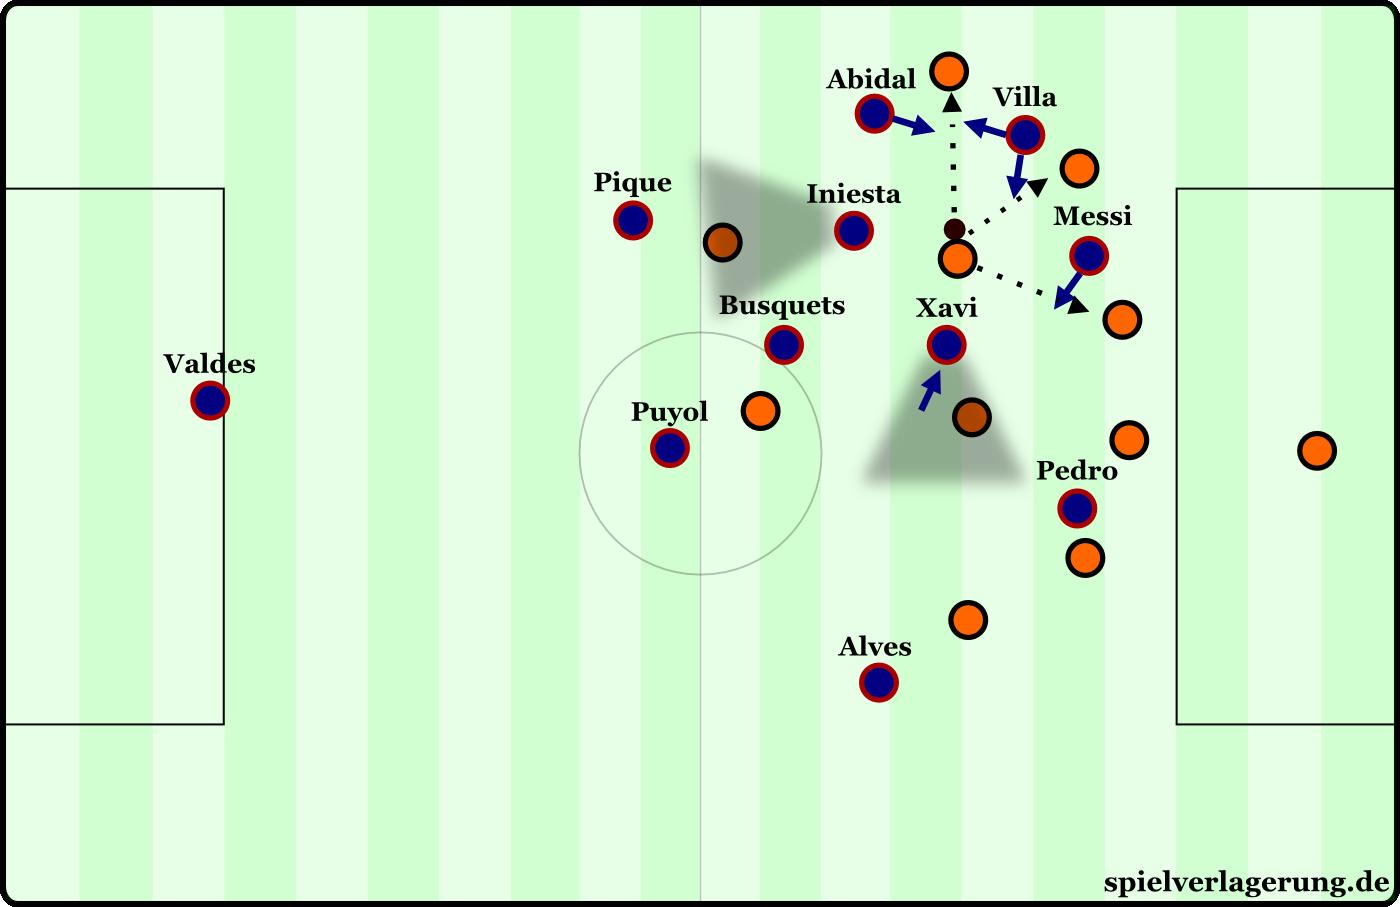 Guardiola's passing-lane oriented counterpressing at Barcelona.